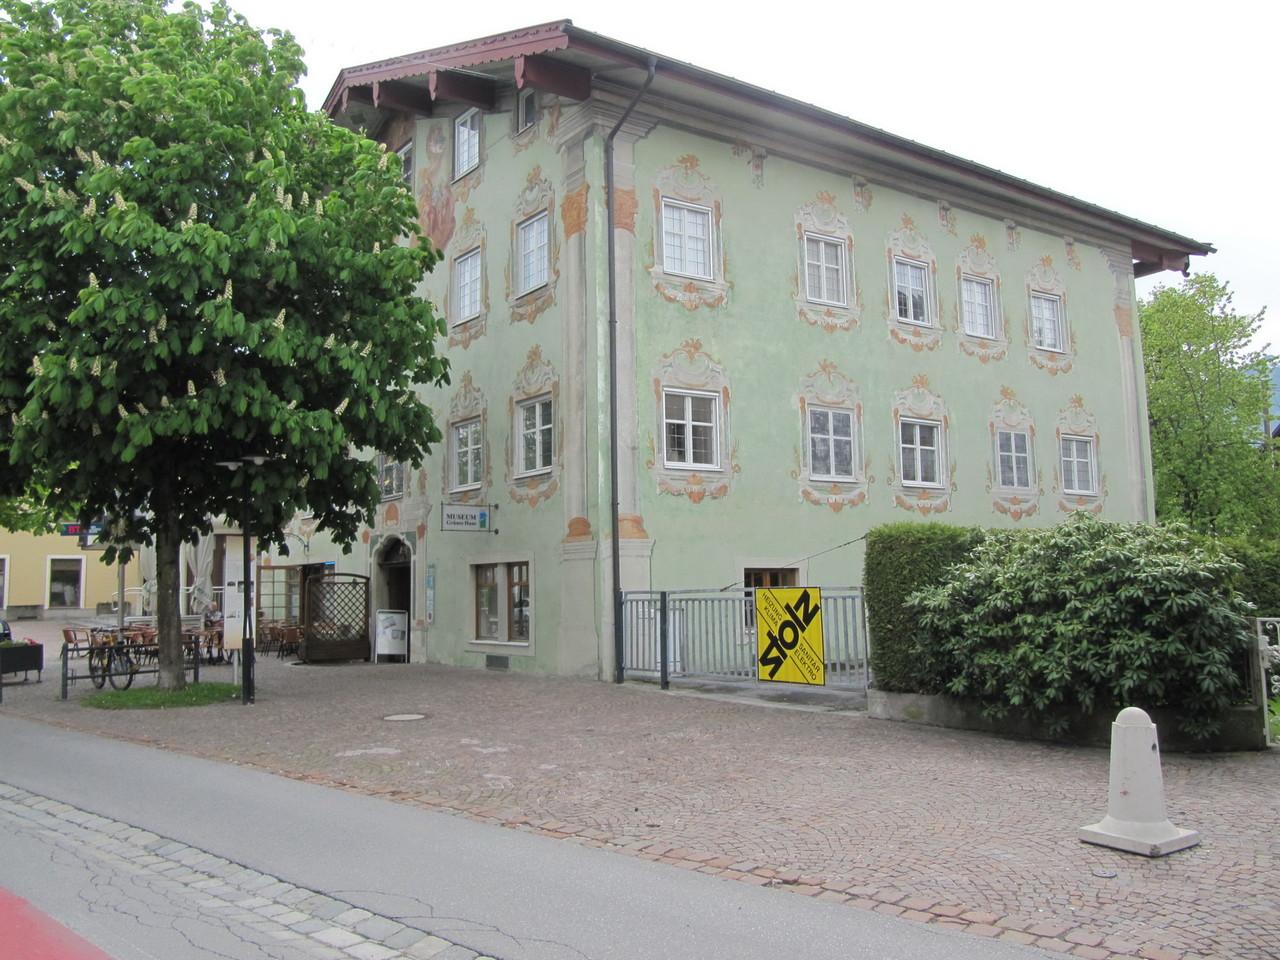 Heimat Museum - Grünes Haus - Reutte